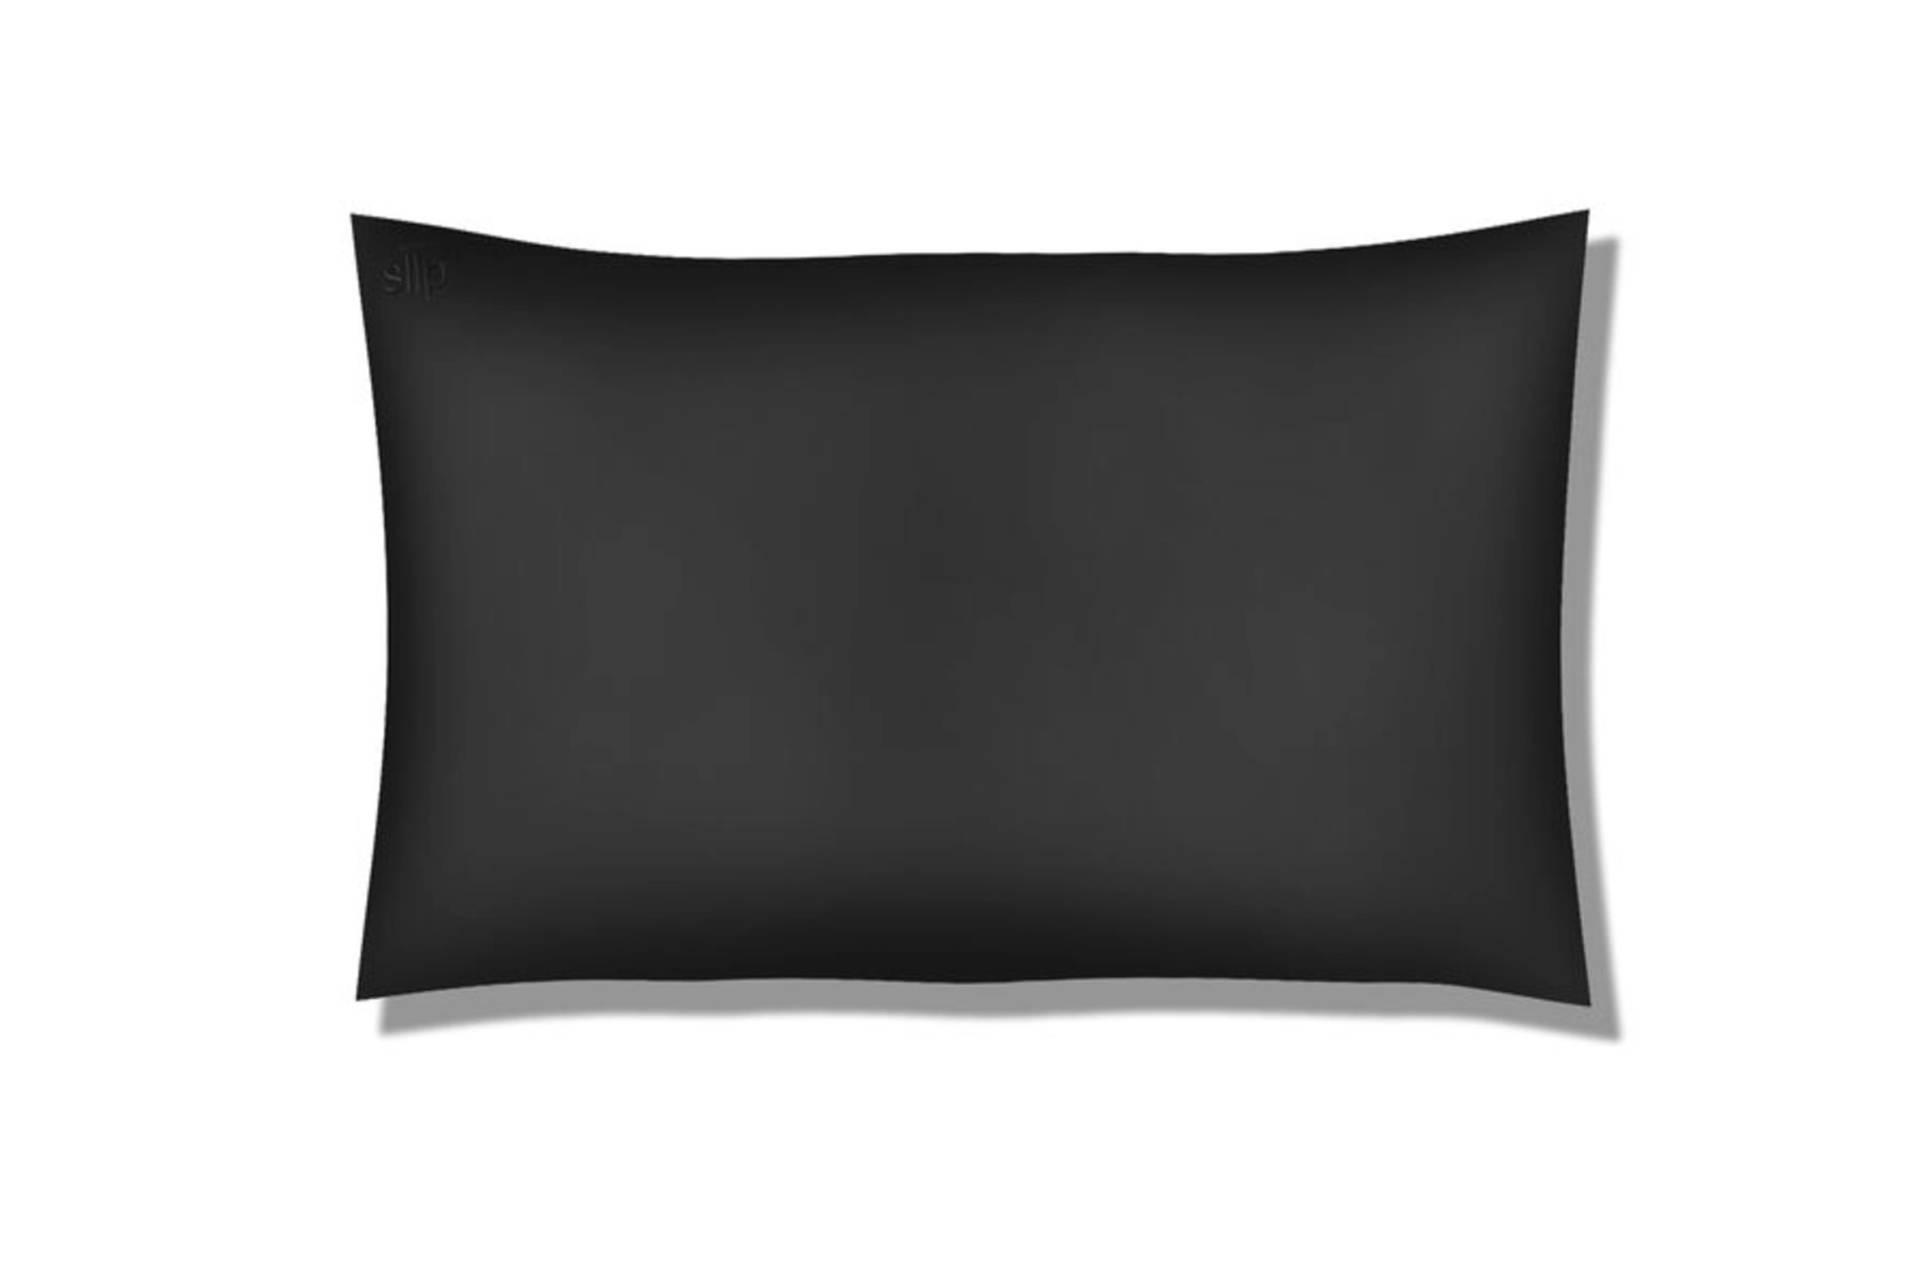 Pillow Active Cold & Flu Pillow Case